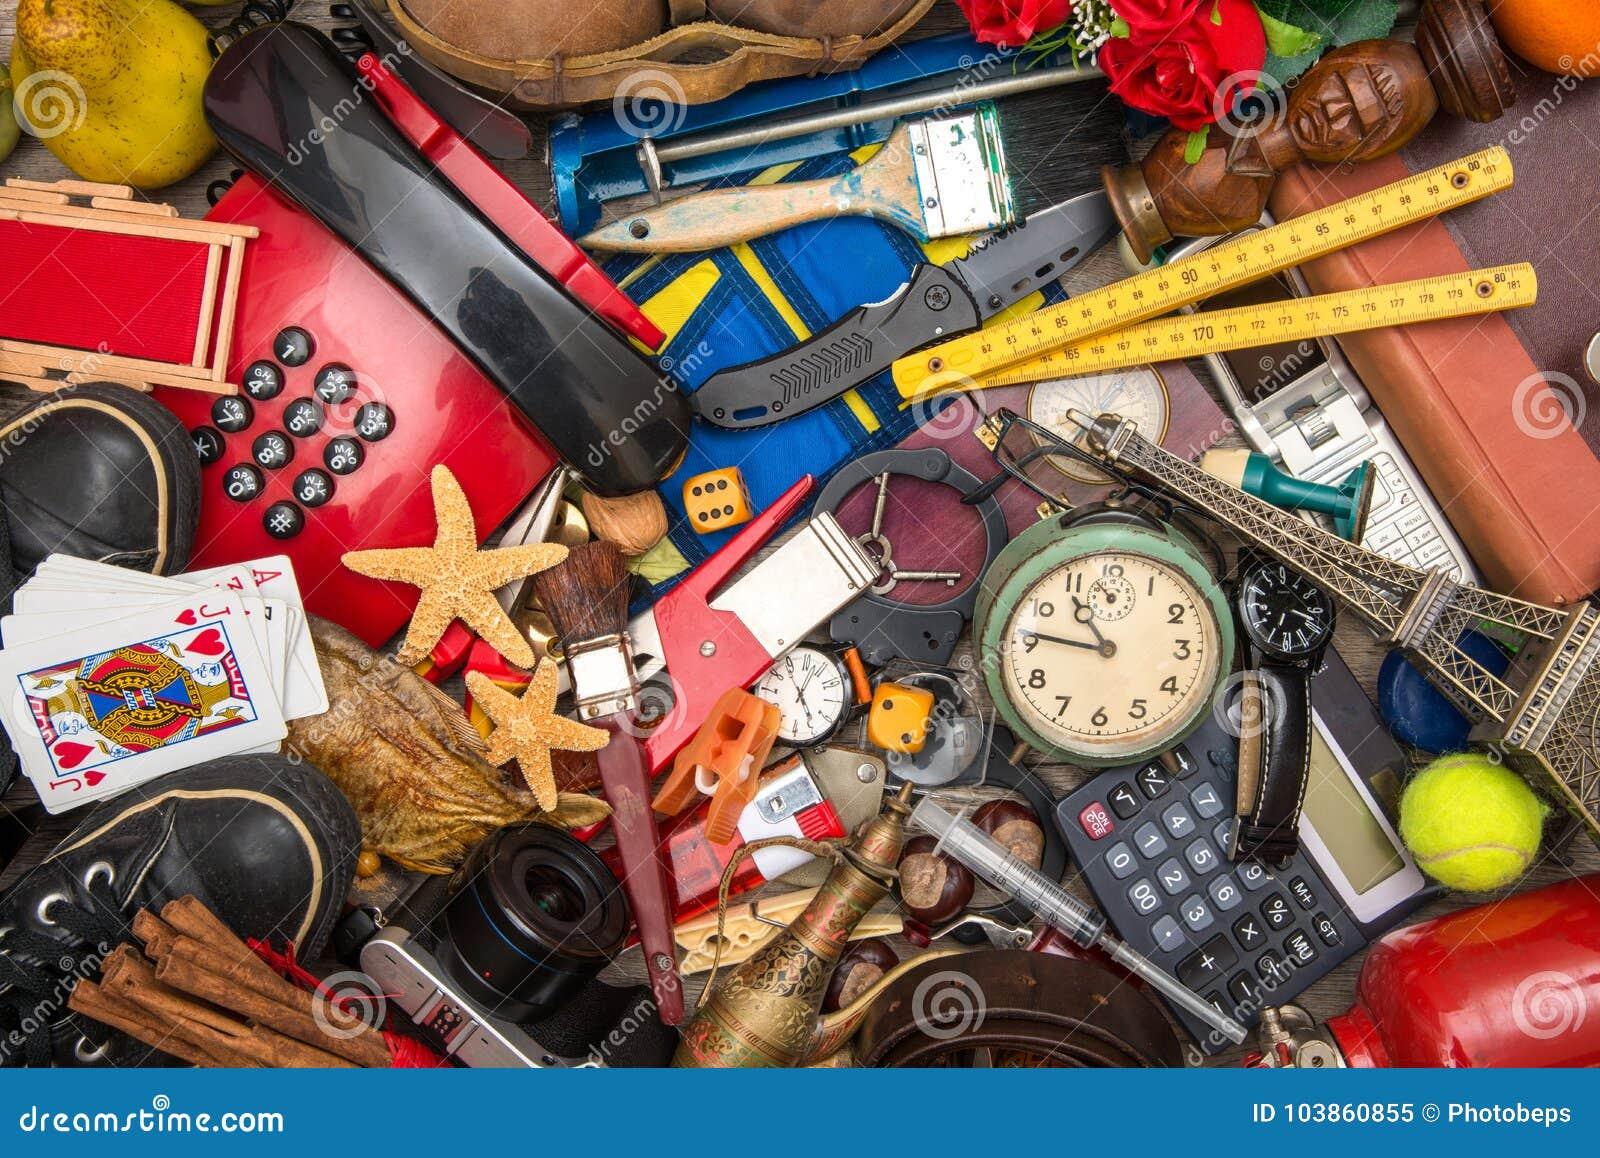 Många objekt i kaos